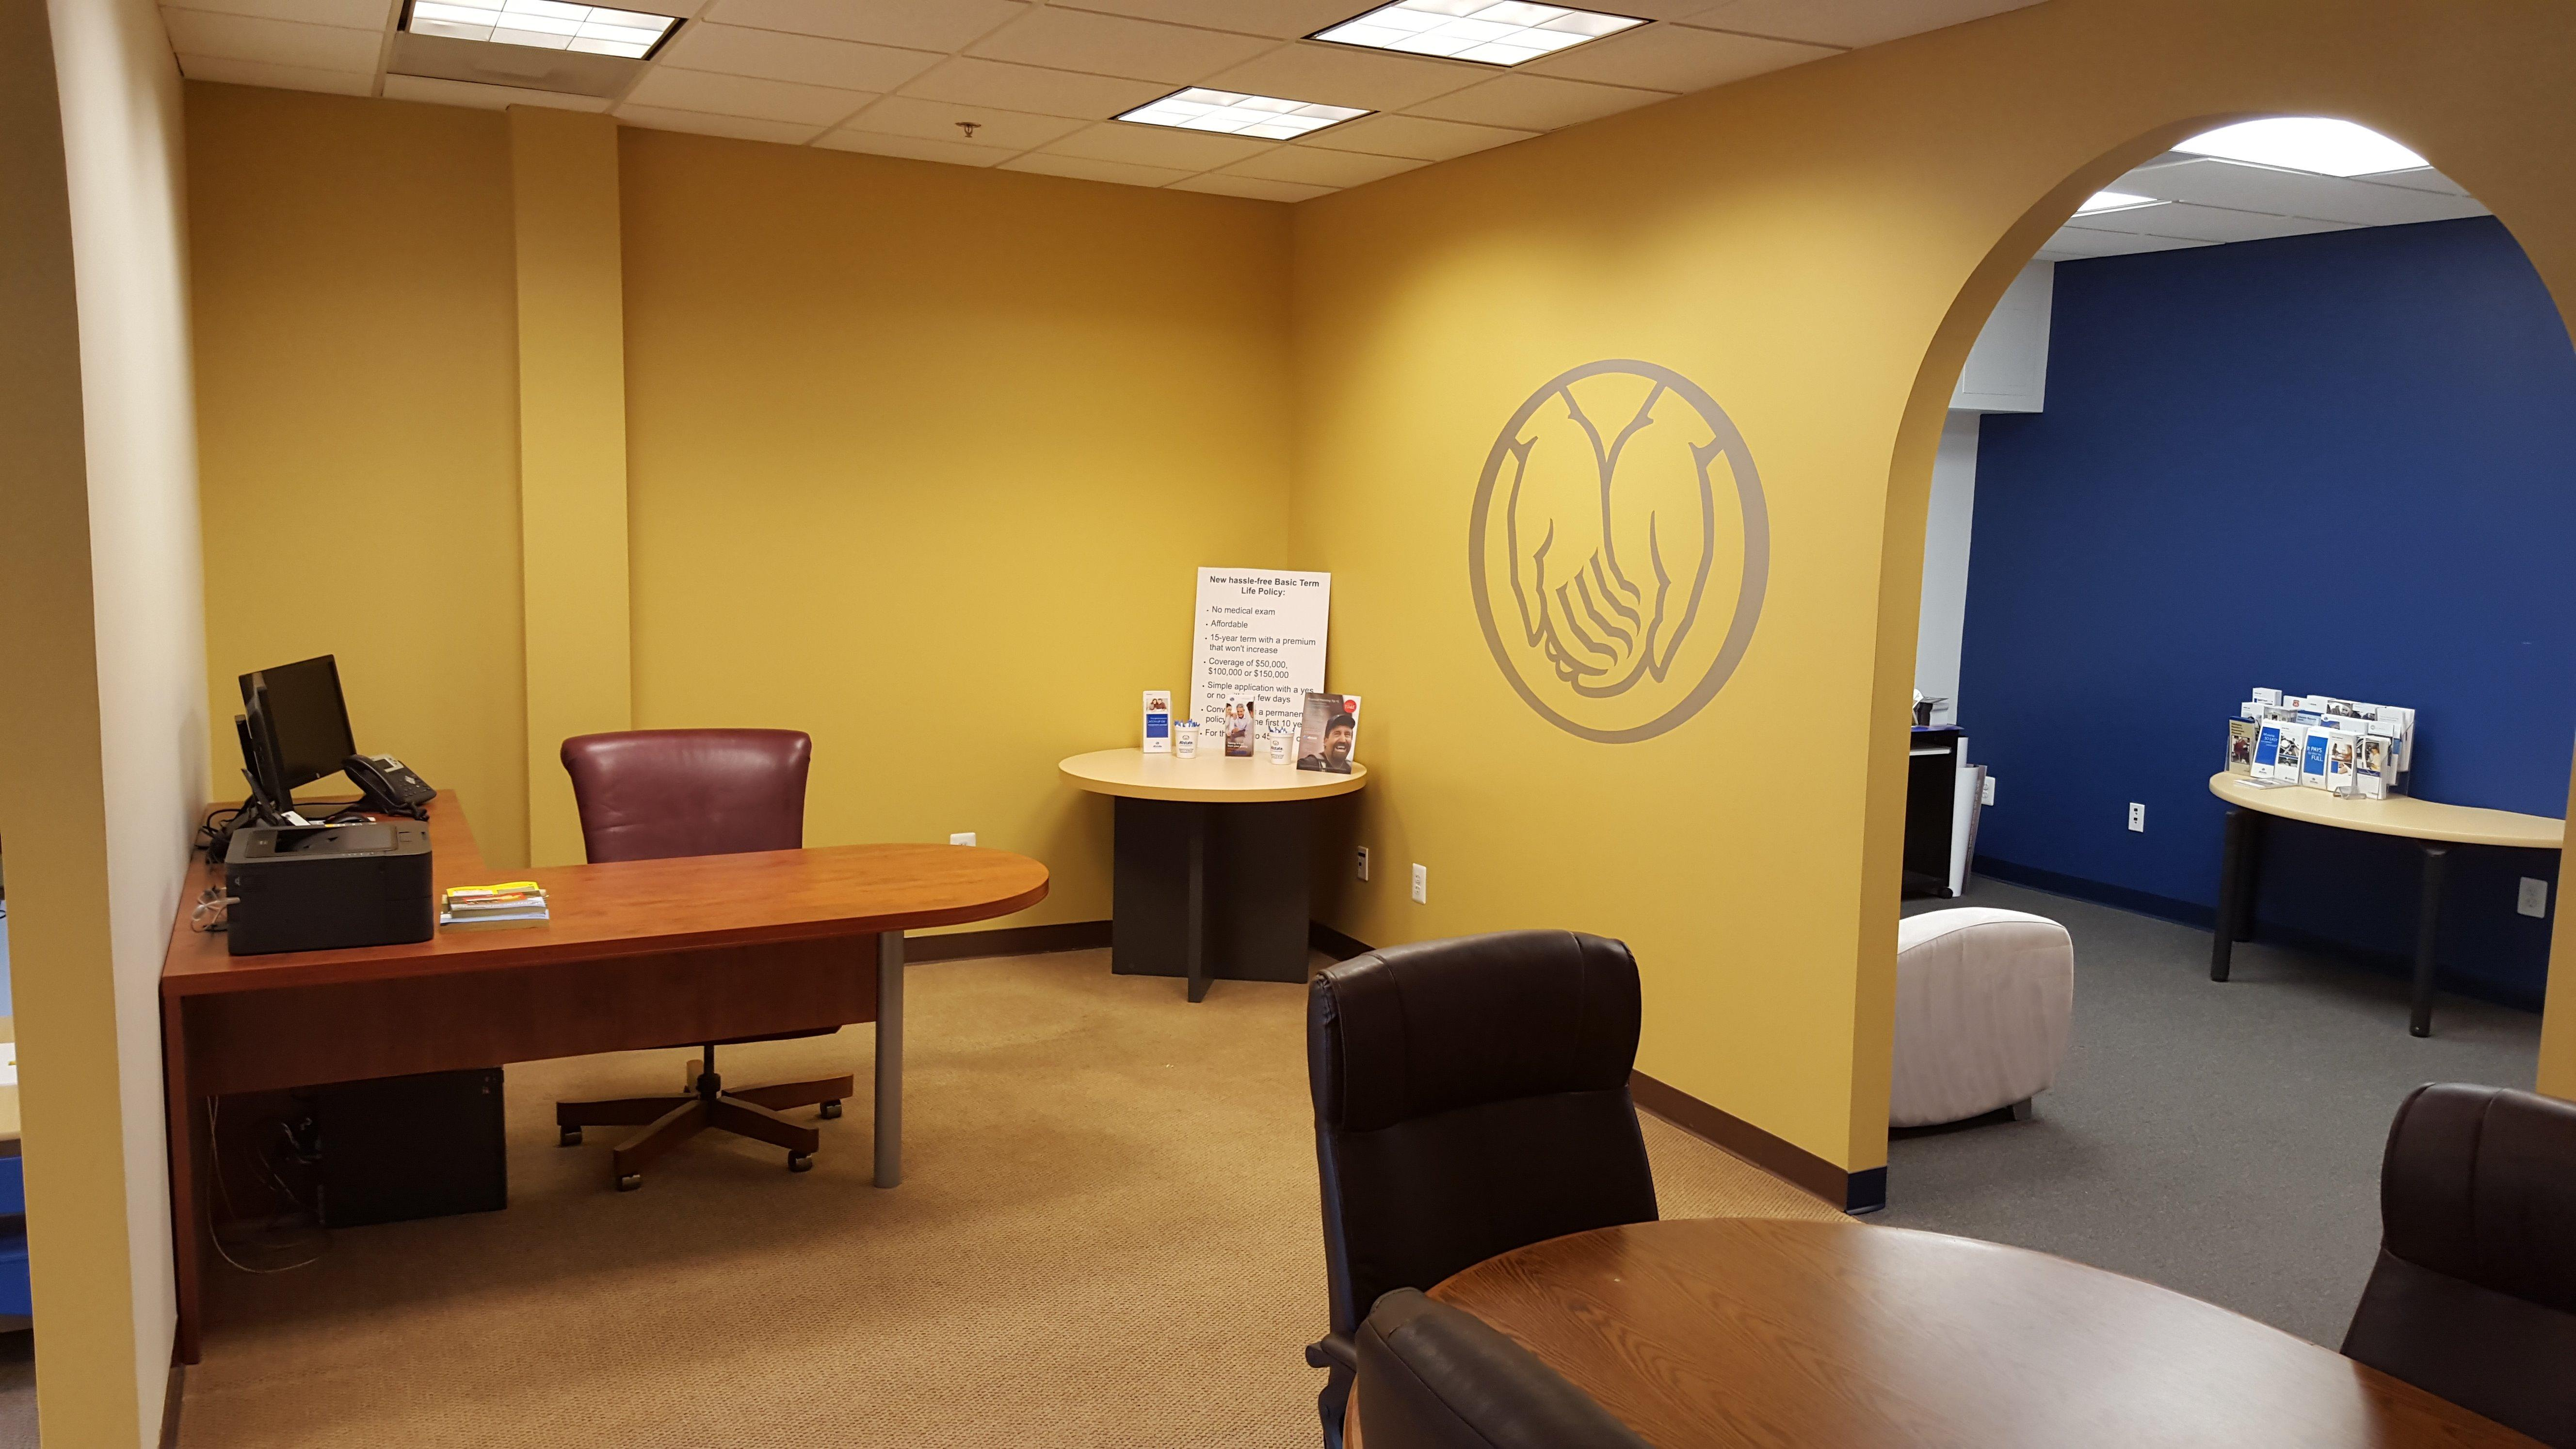 Jason P. Sengpiehl: Allstate Insurance image 1